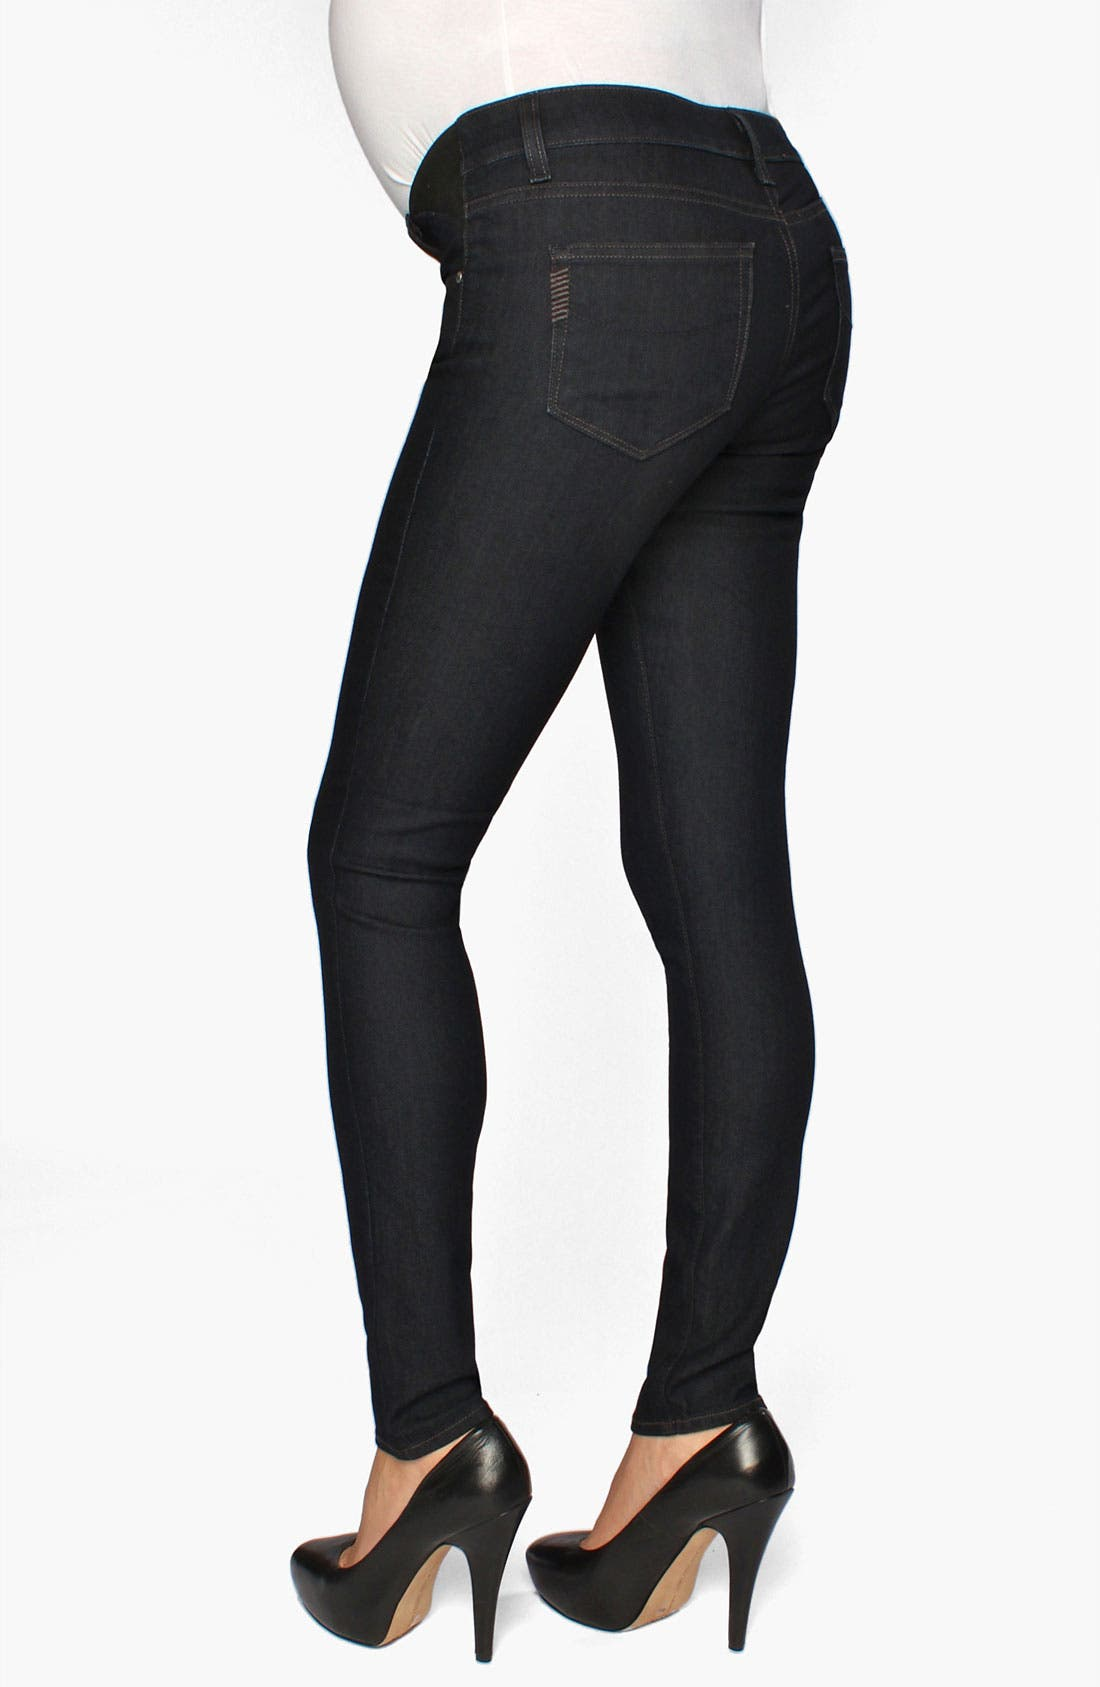 Alternate Image 1 Selected - Paige Denim 'Verdugo' Maternity Ultra Skinny Jeans (Twilight)